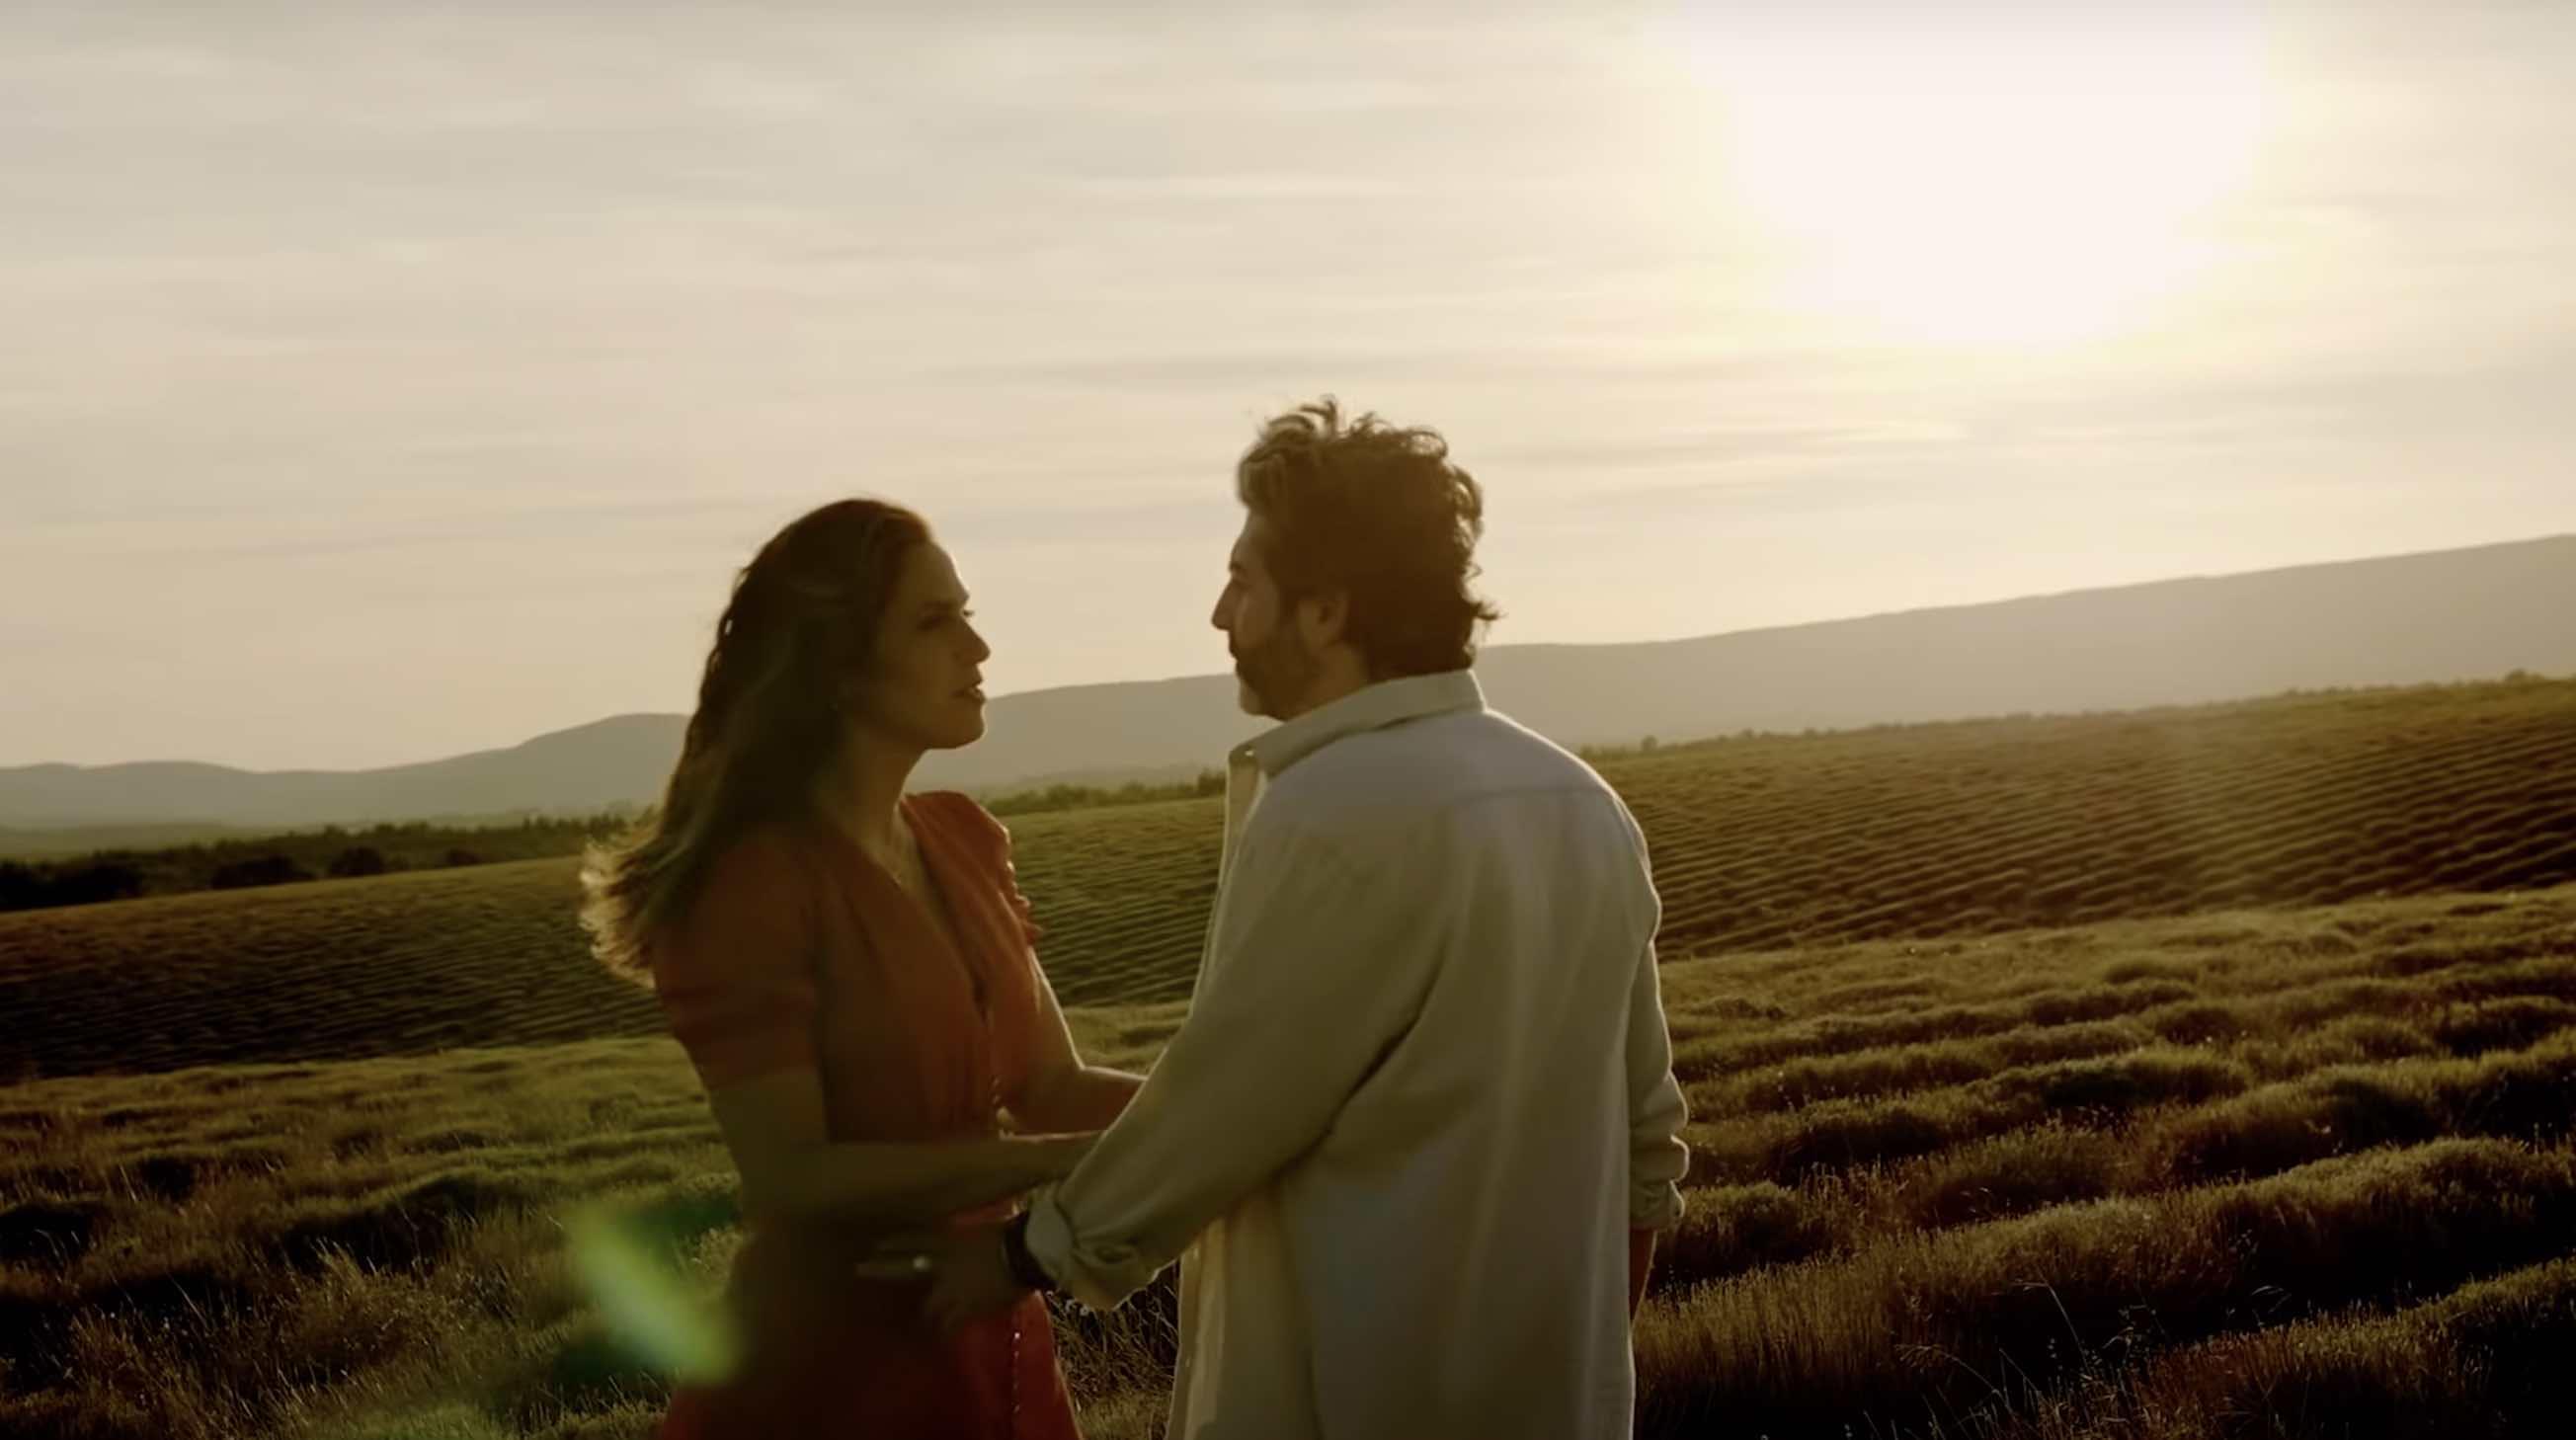 Elisa Tovati - John Mamann - Tout va bien -